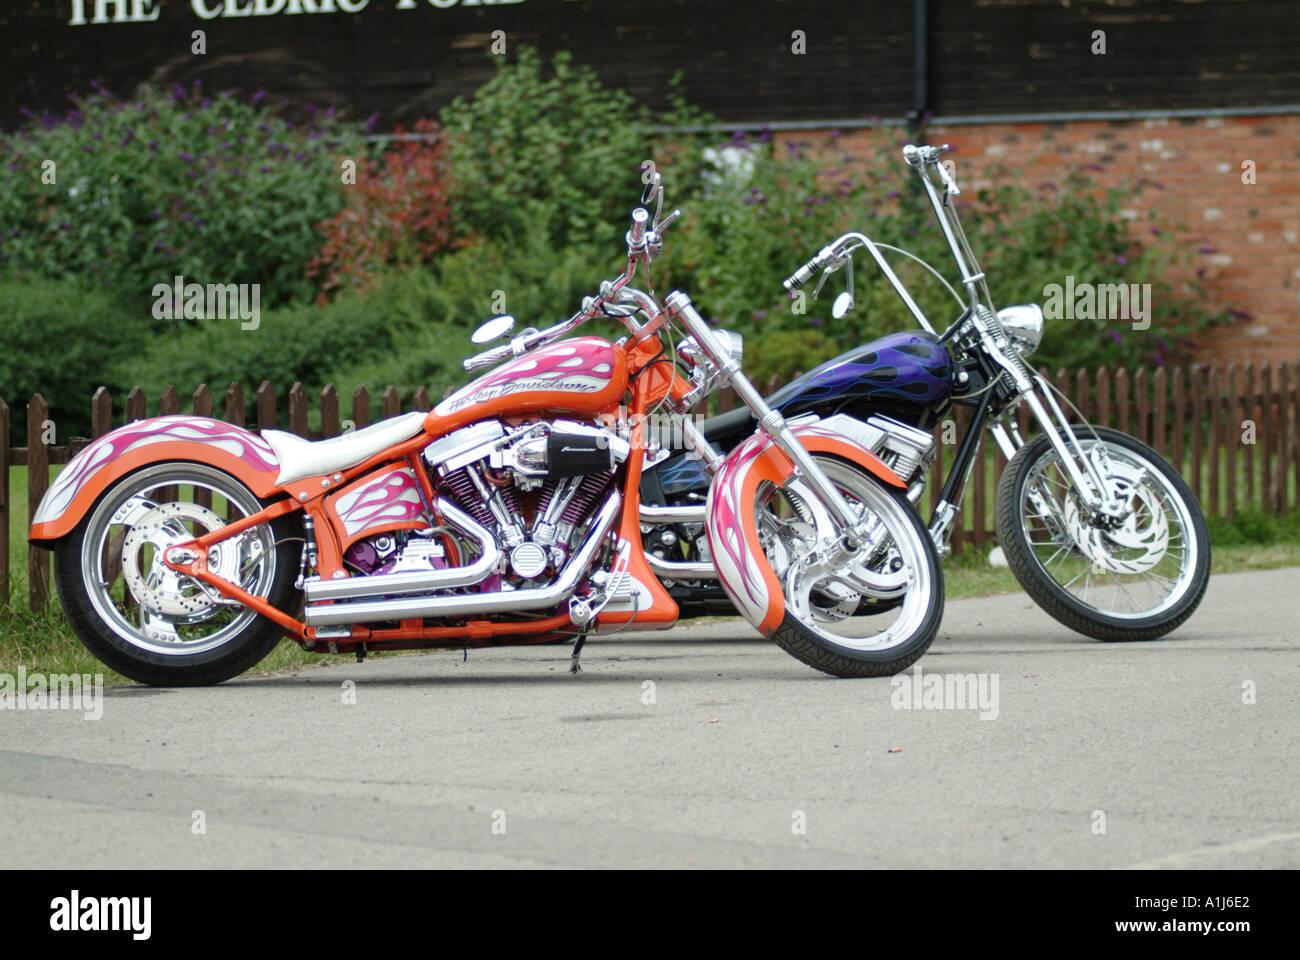 harley davidson custom motor cycle bike v twin american america customised modified chopper - Stock Image